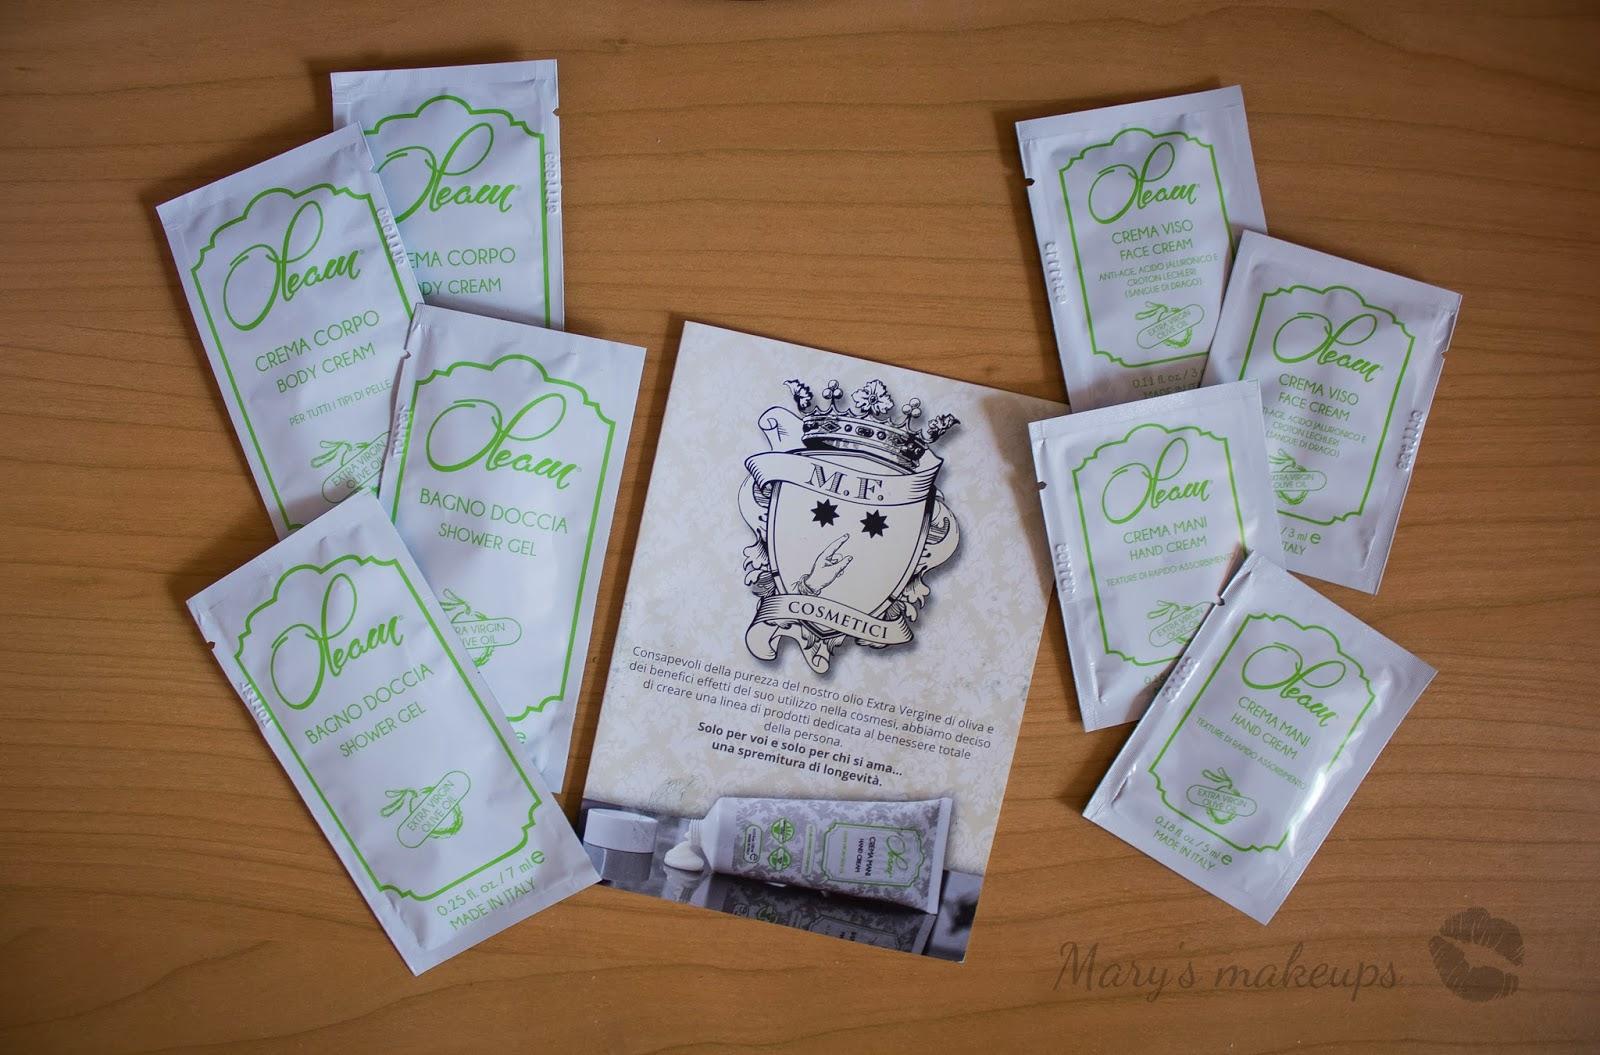 Stevia a eczema